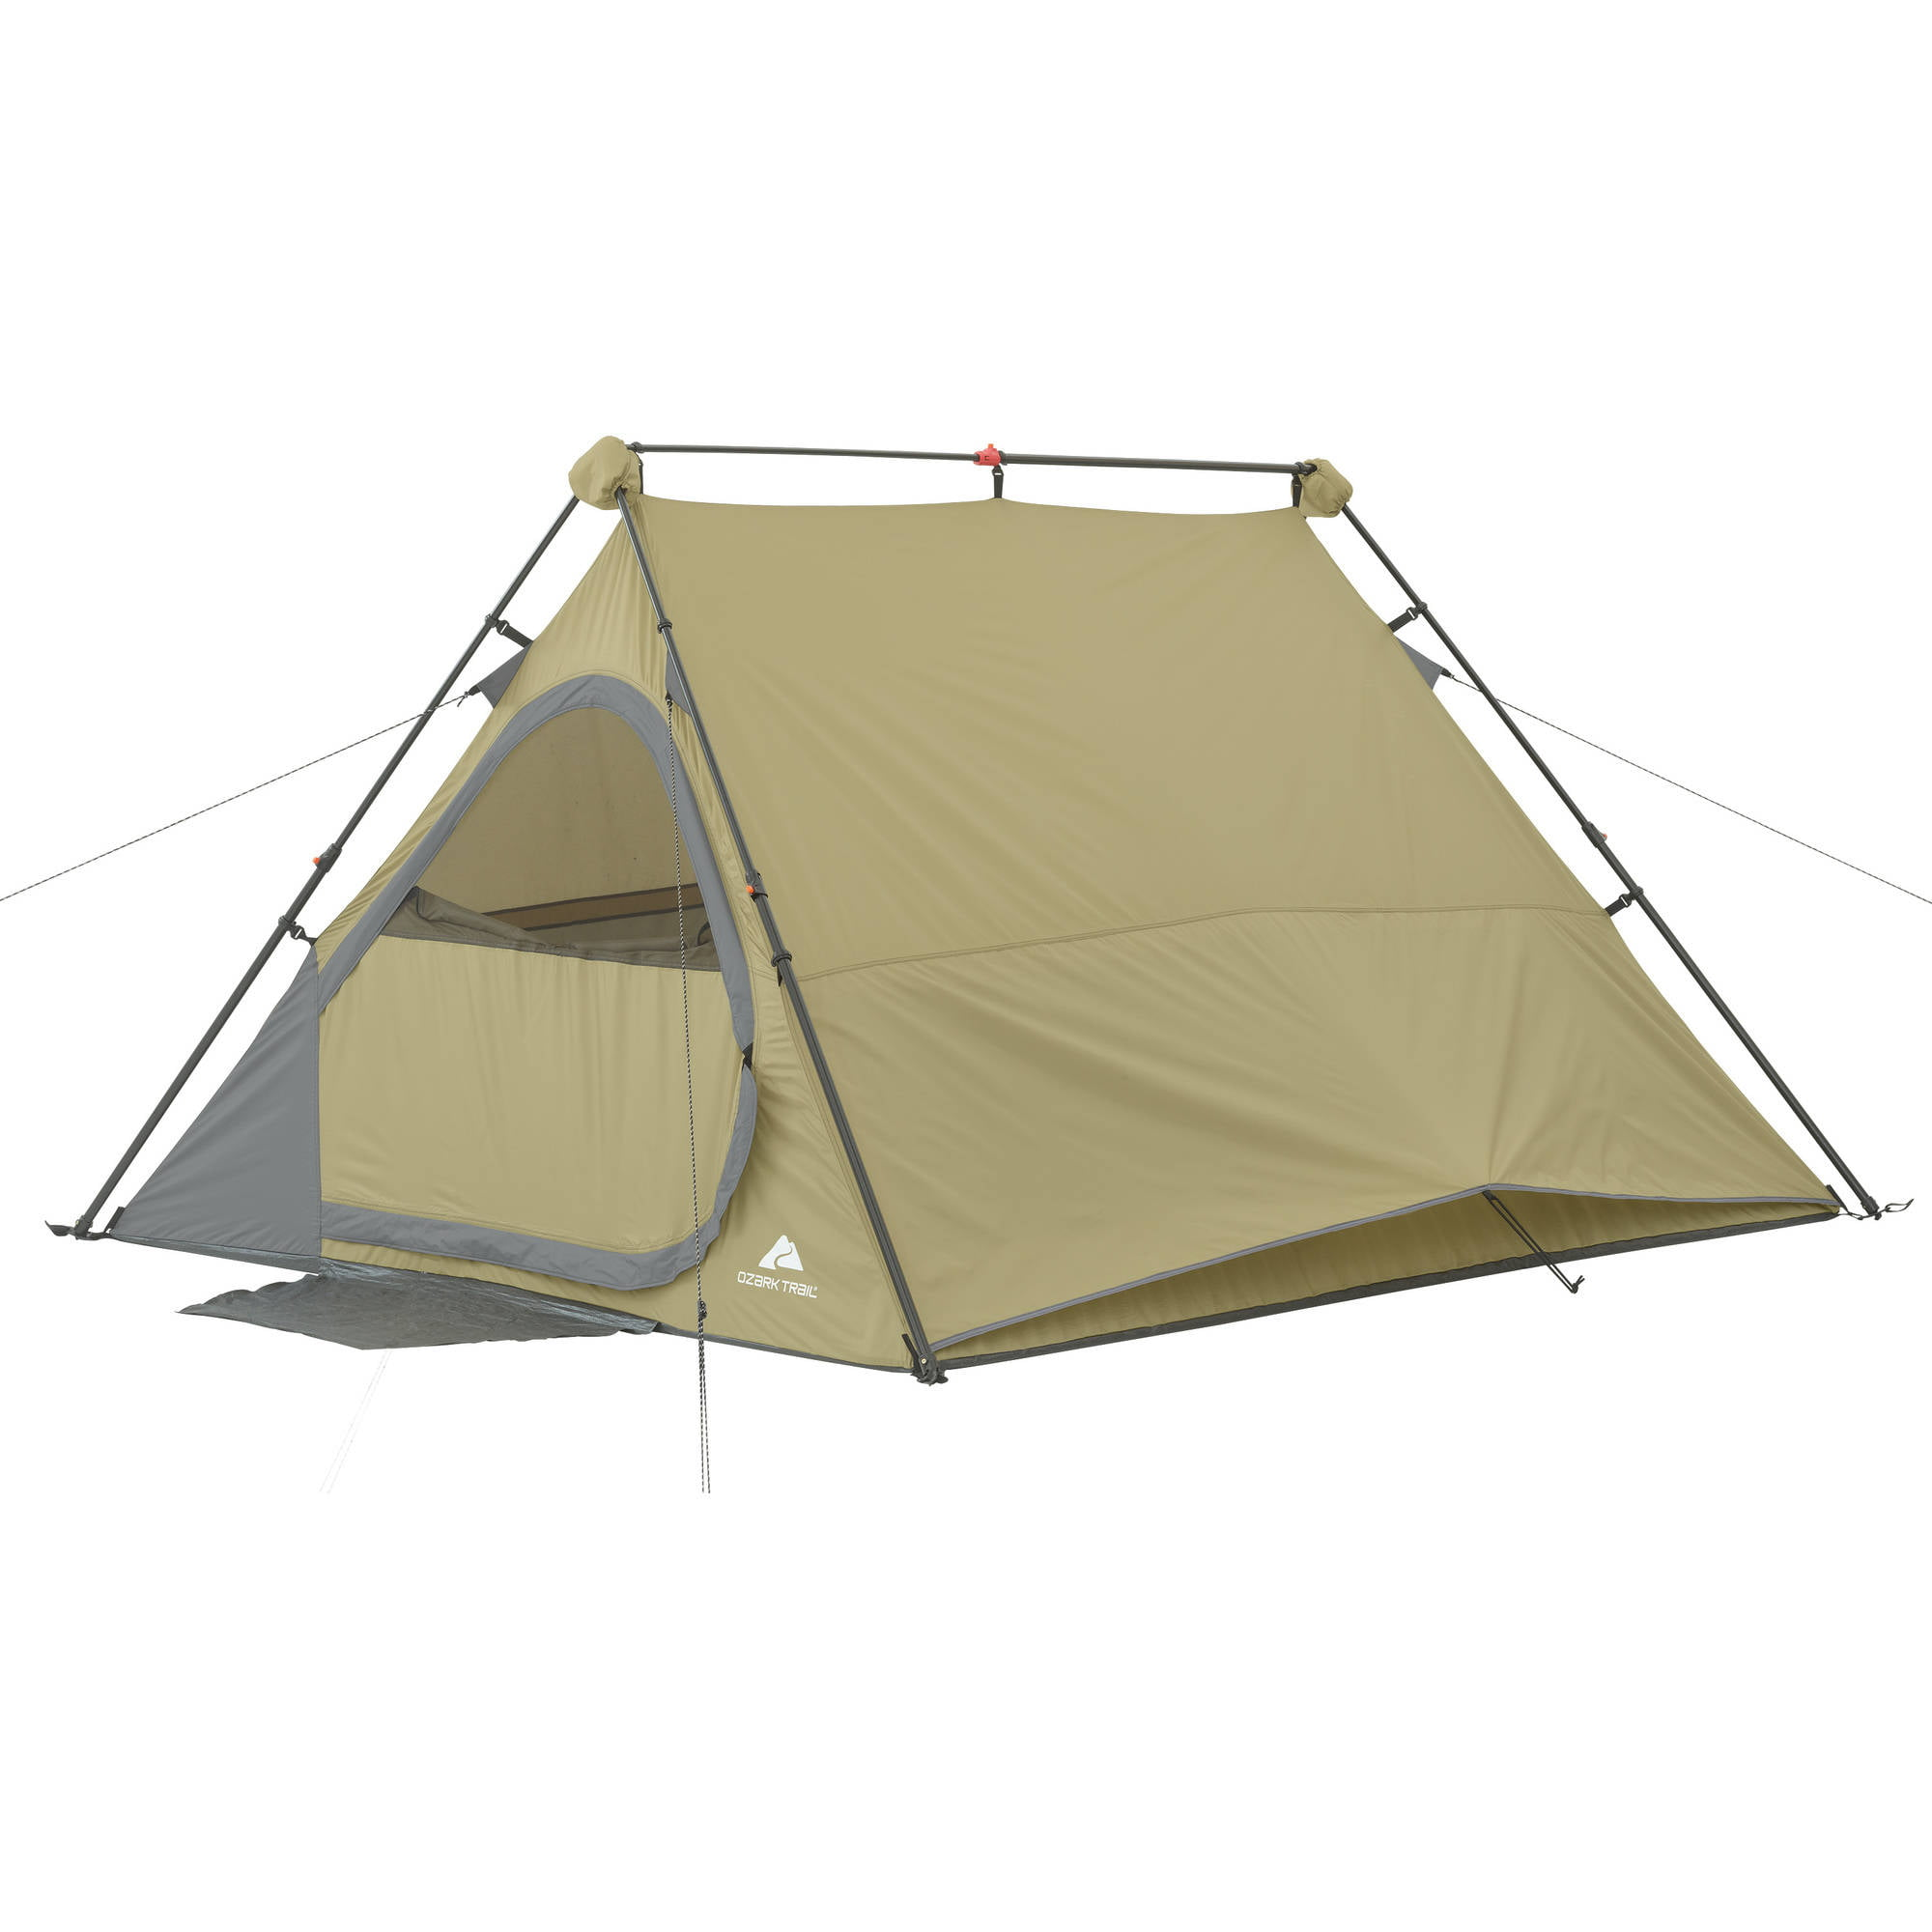 Ozark Trail Instant Tents Amp Ozark Trail 6 Person Instant